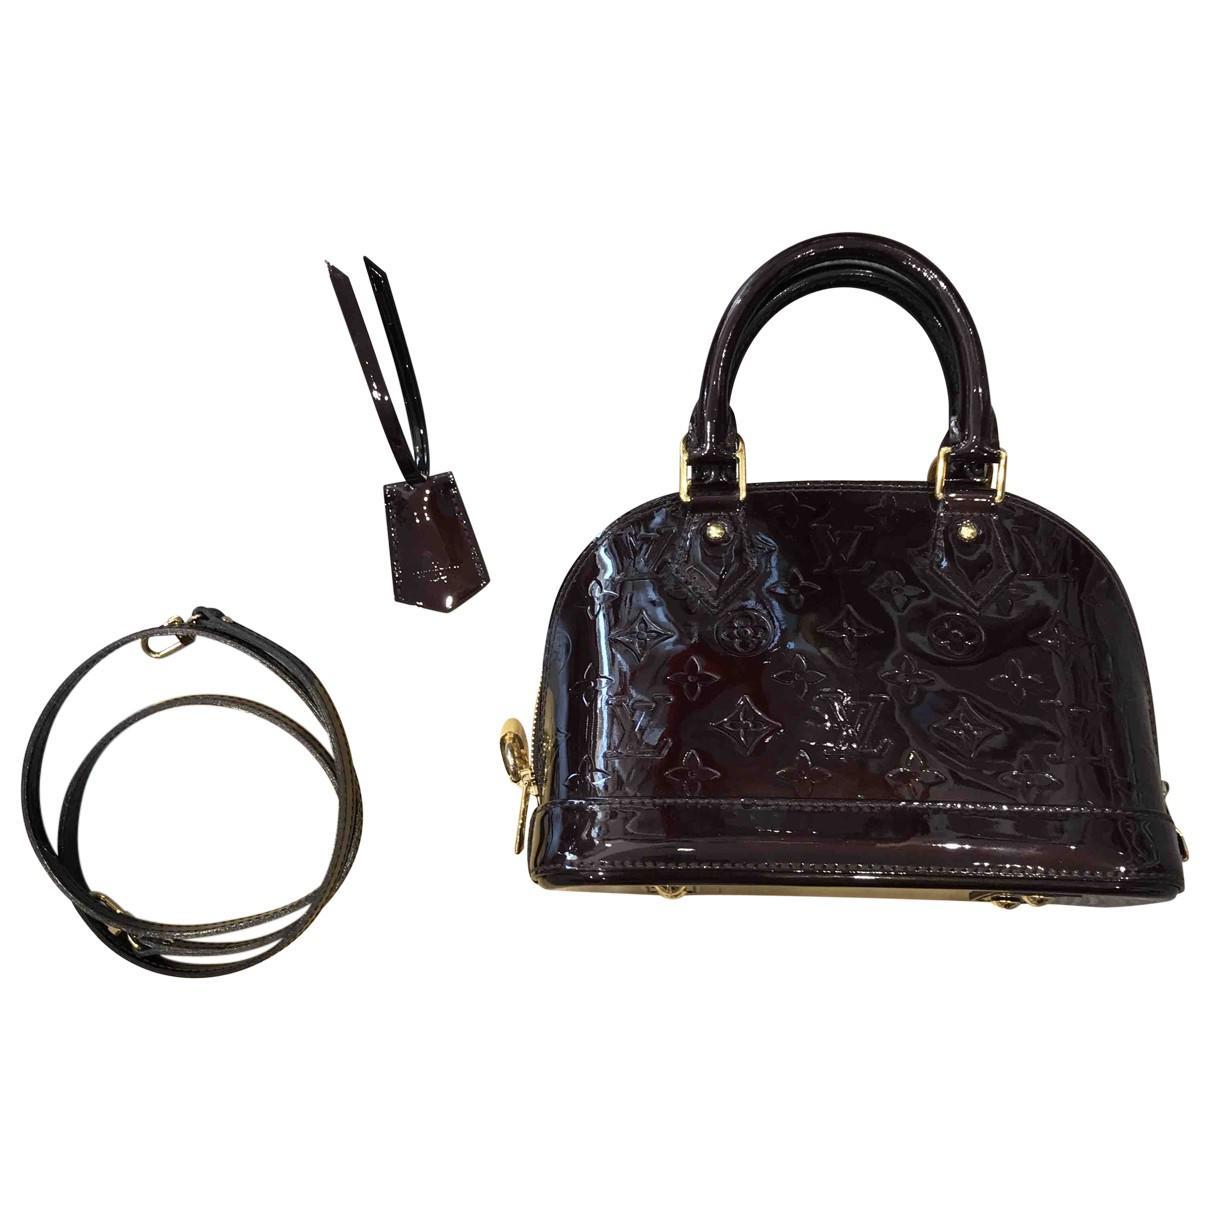 e53be9728b3 Louis Vuitton Alma Bb Patent Leather Crossbody Bag in Black - Lyst